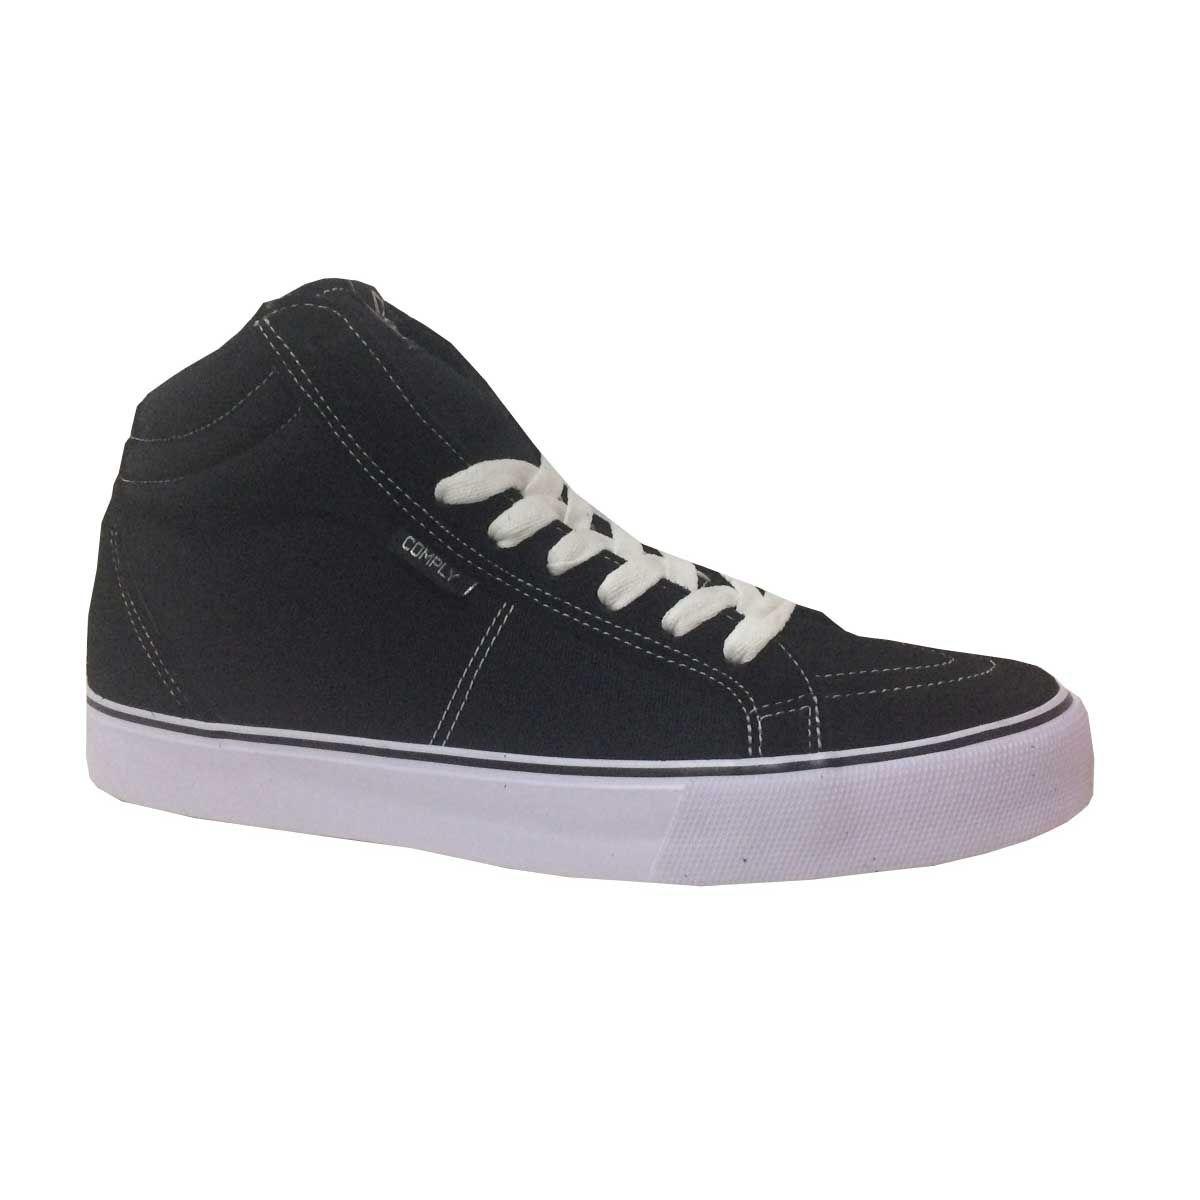 Tênis Comply skate Bota unissex 44055